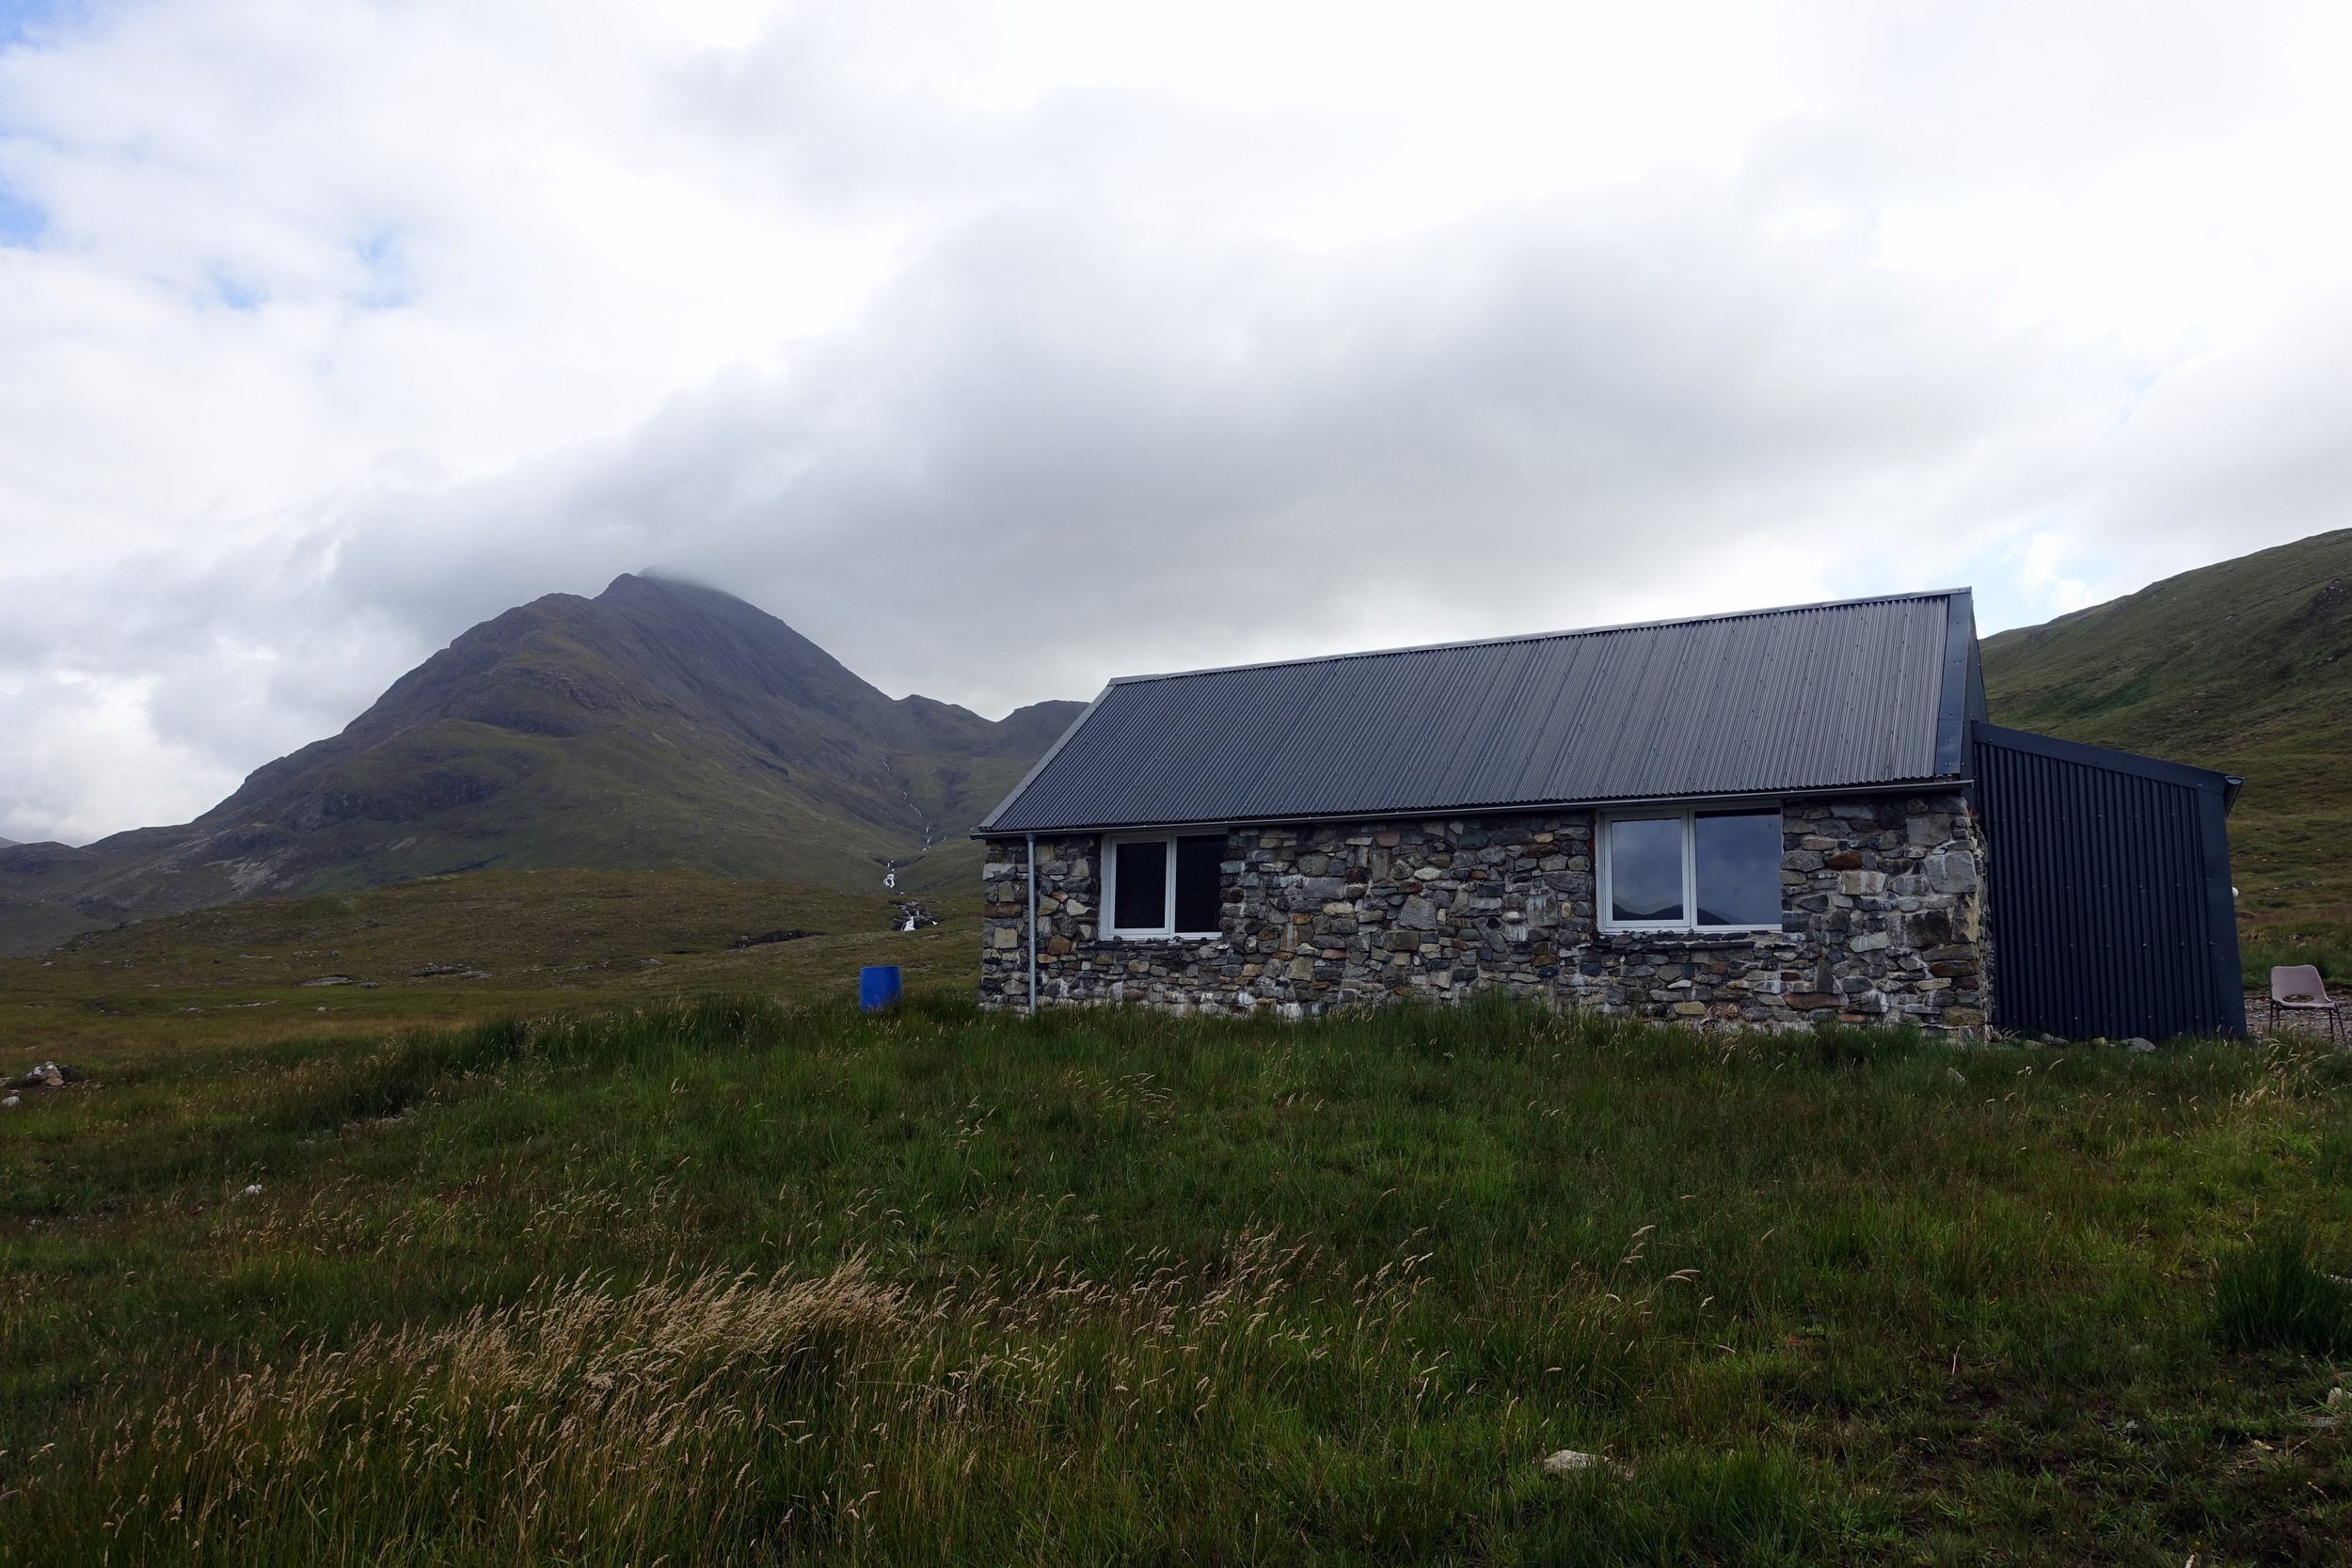 camping isle of skye camasunary bothy hikers accommodation